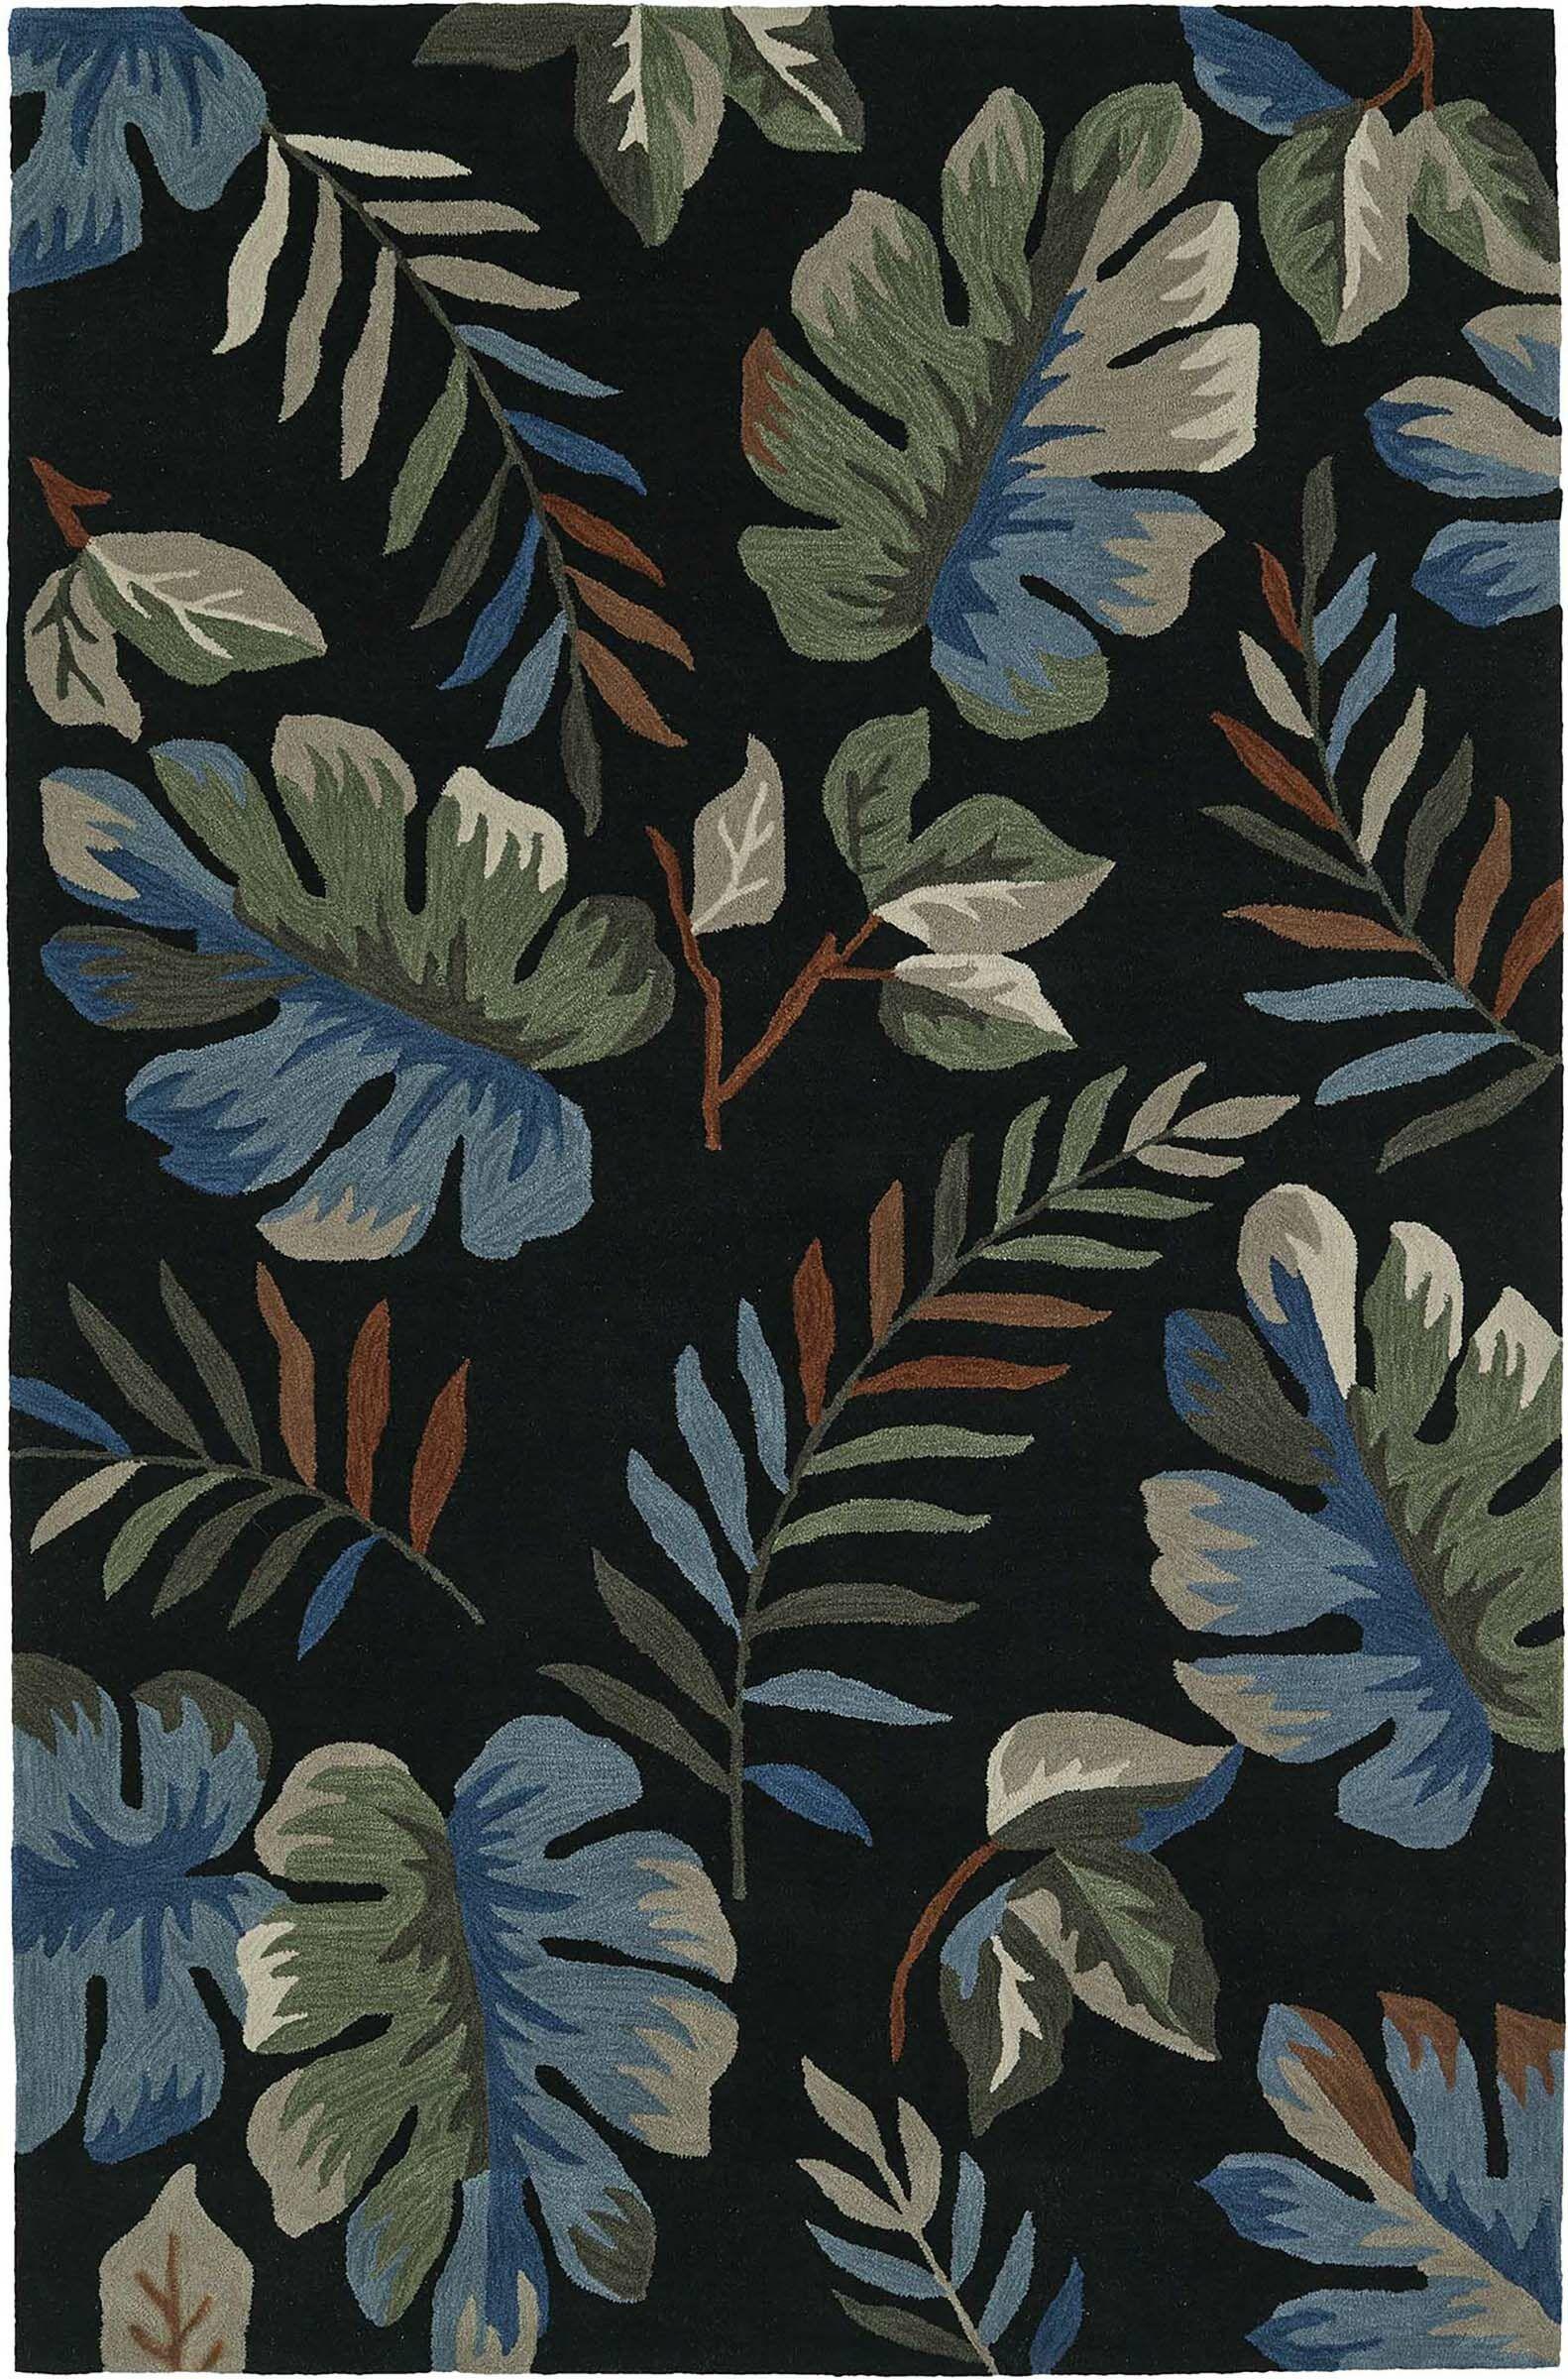 Maui Hand-Tufted Black Area Rug Rug Size: Rectangle 5' x 7'6